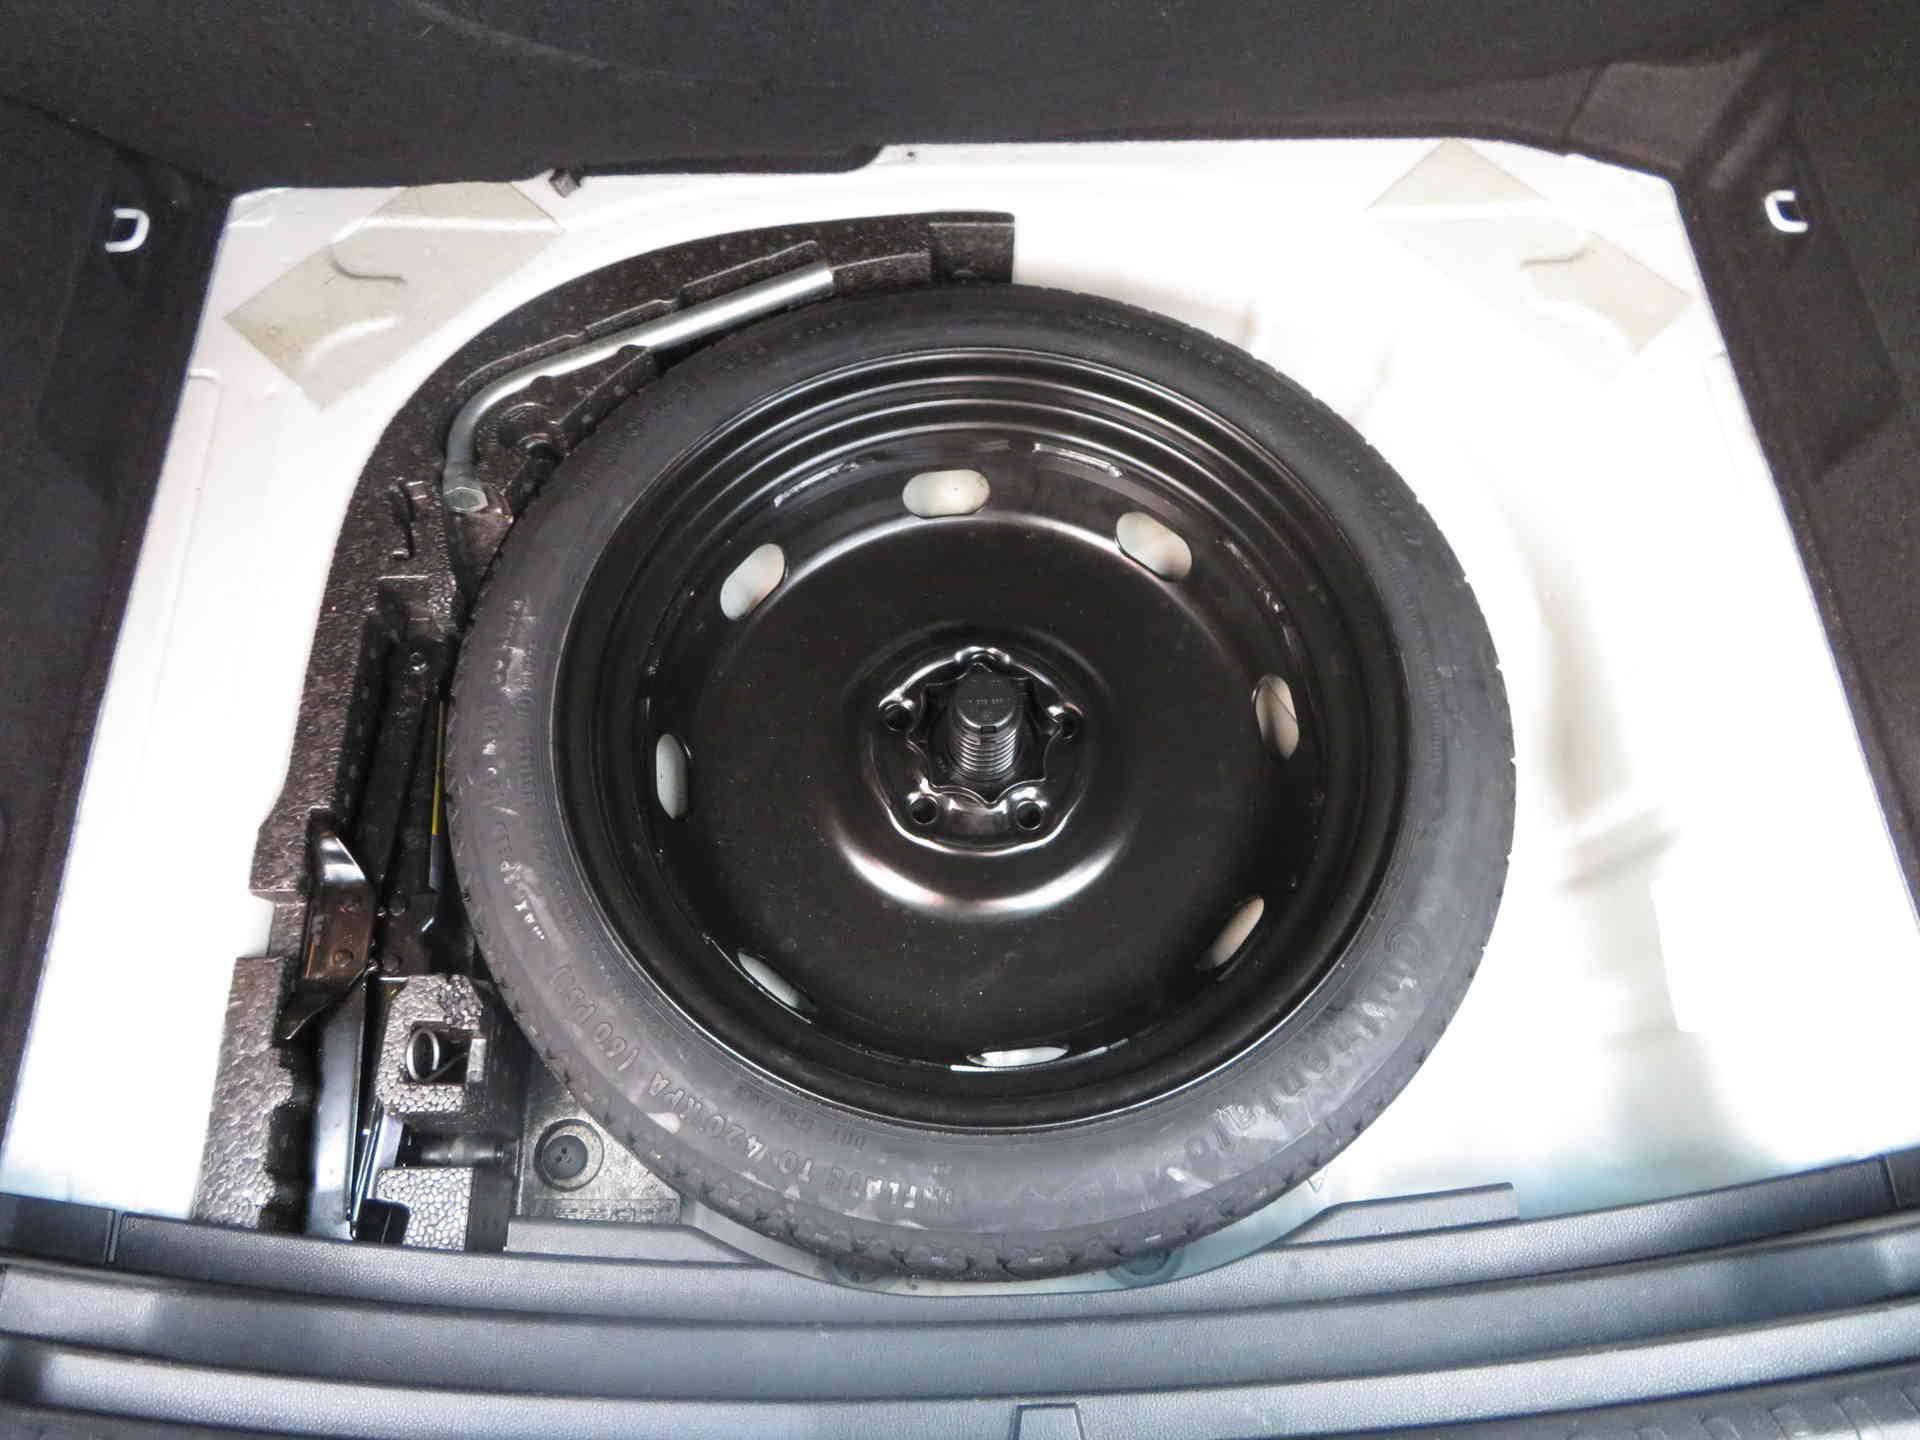 15 - Ateca 1.6 TDI 115 ch Start/Stop Ecomotive